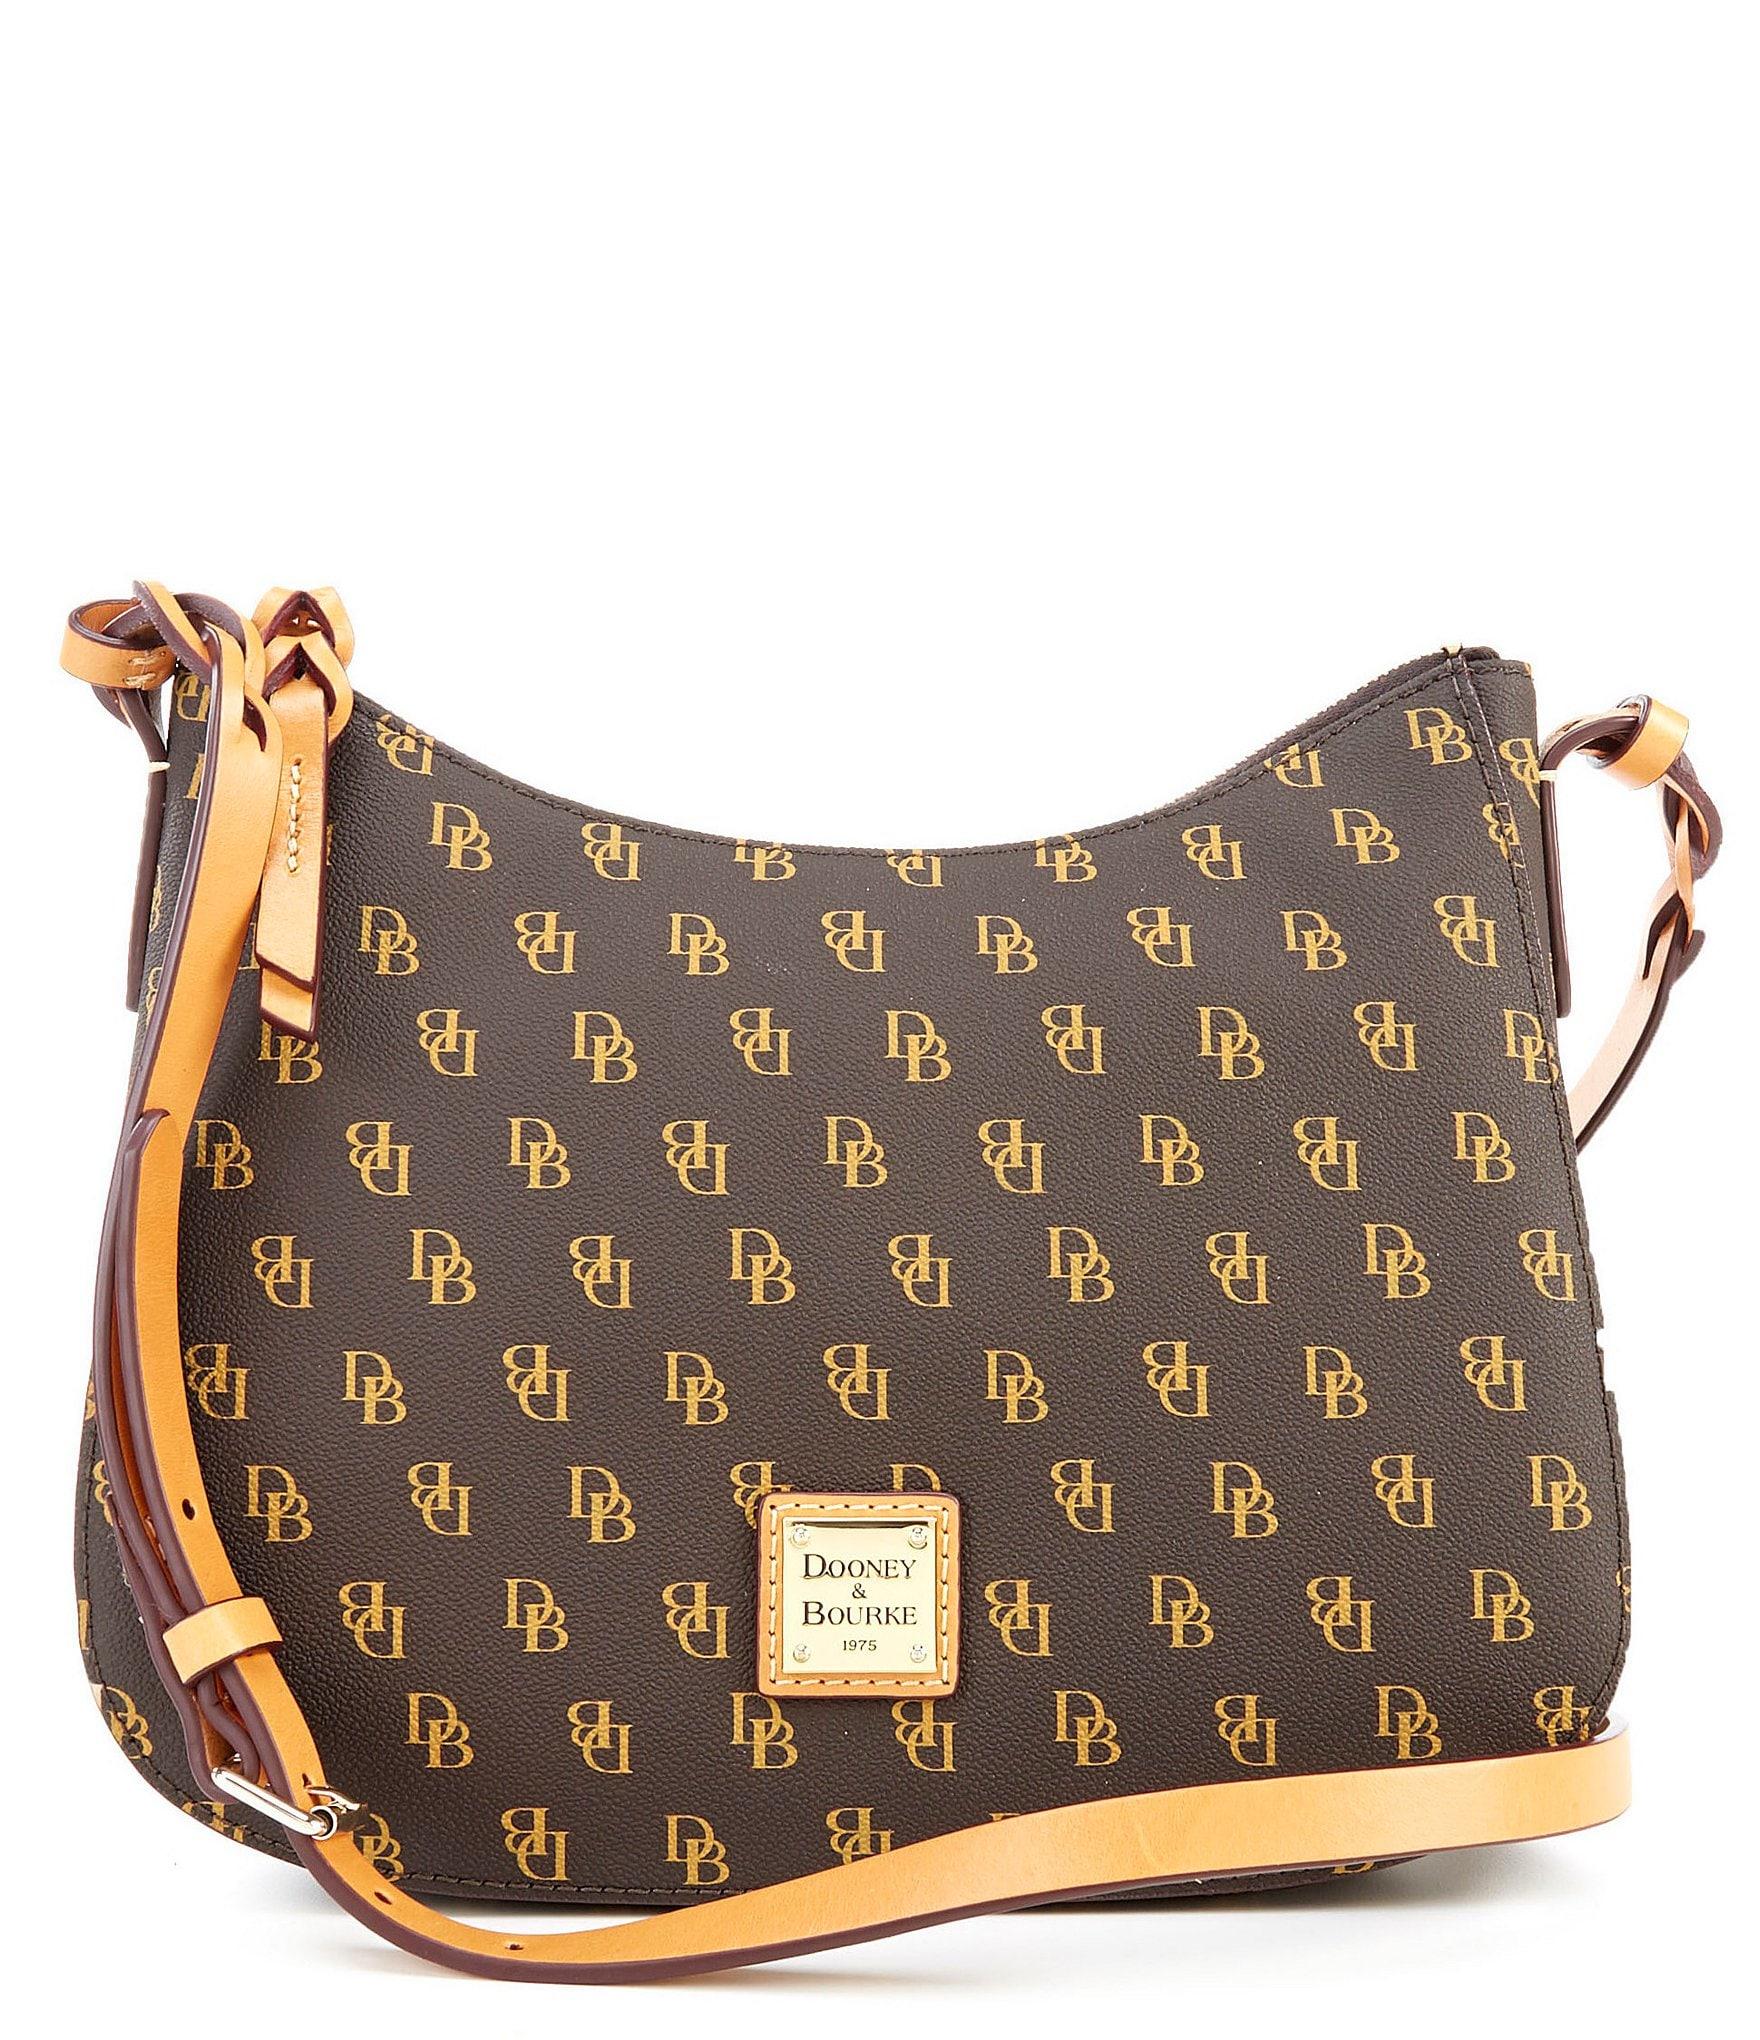 Dooney & Bourke Blakely Collection Tracy Signature Crossbody Bag   Dillard's